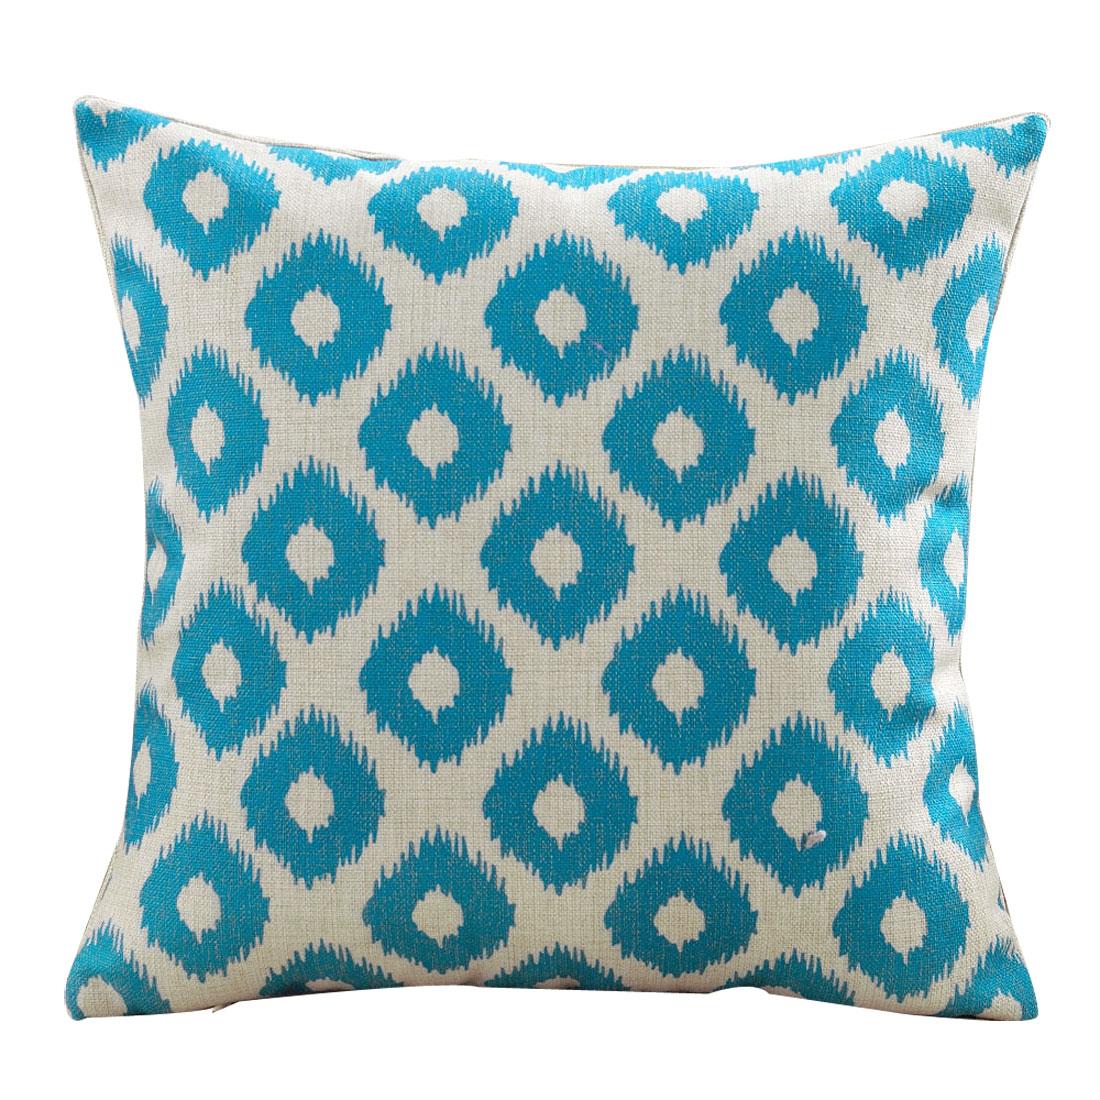 Car Seat Sofa Cotton Linen Pop Geometric Pattern Waist Throw Cushion Pillow Cover